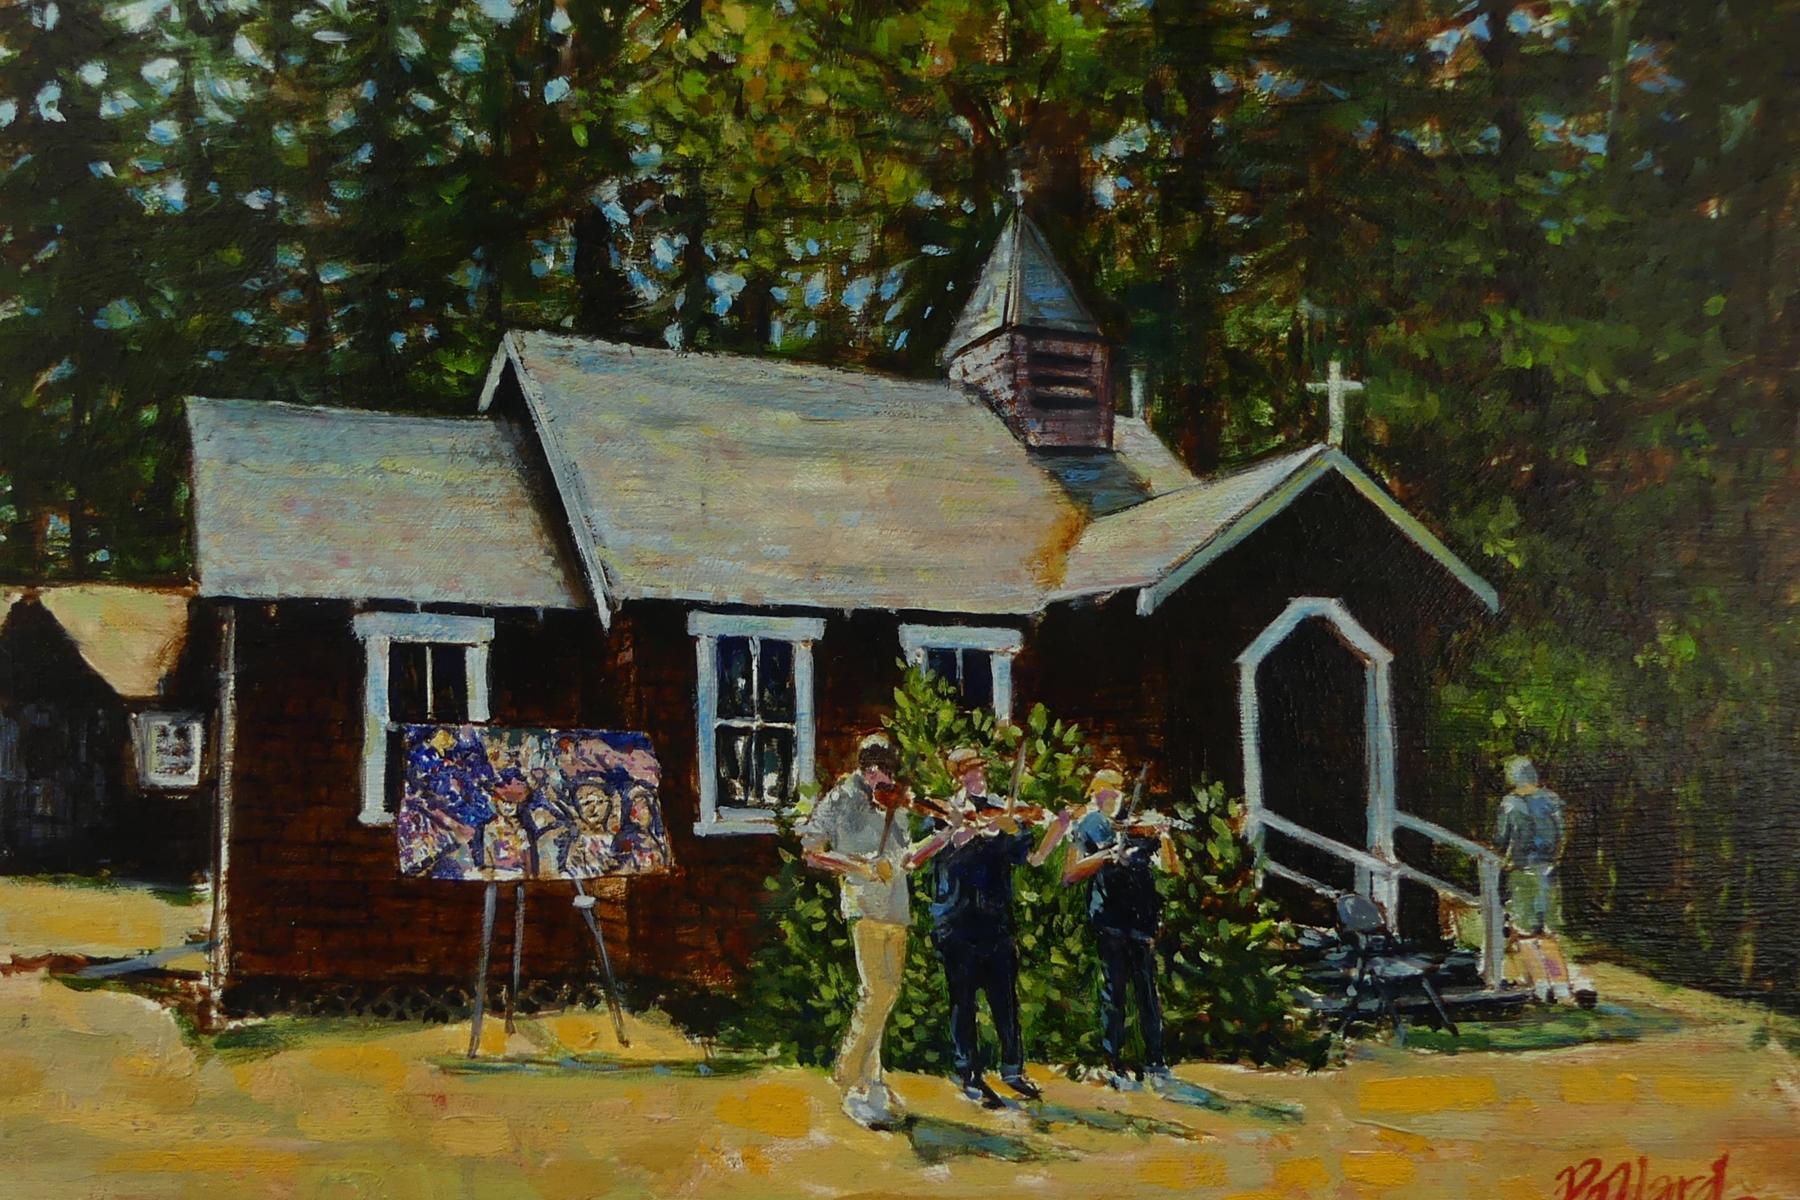 Pender Island | Artist Painter Kim Pollard | Canada | Pollard | Canadian Artist | Art Off The Fence